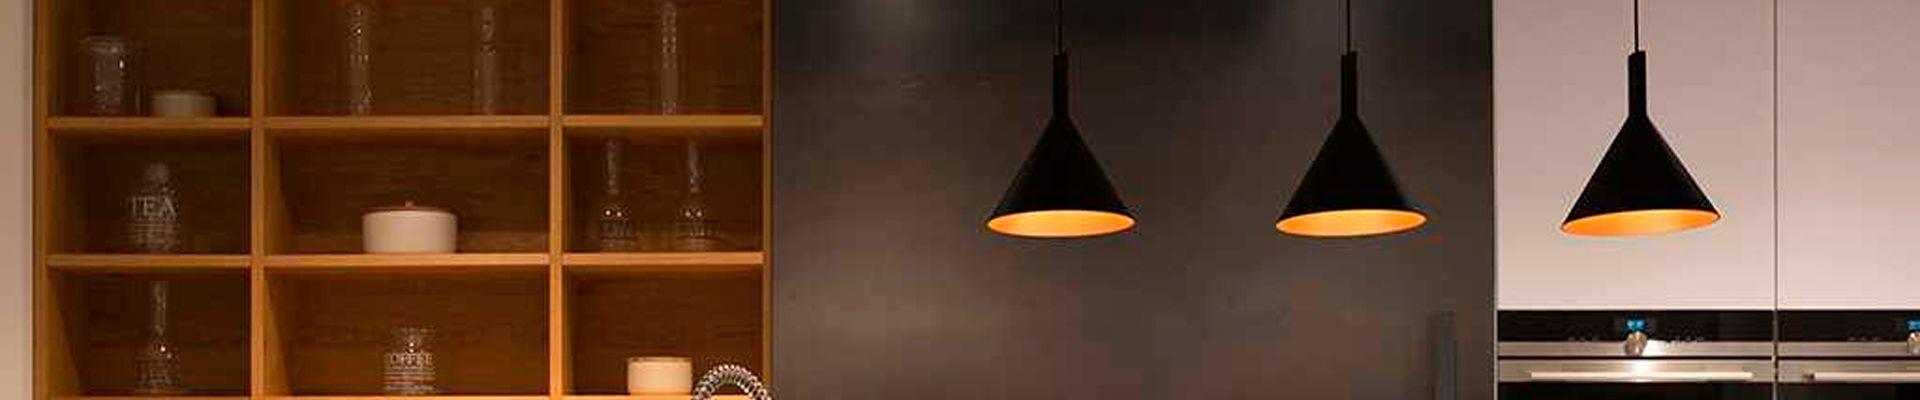 Wever & Ducré hanglampen